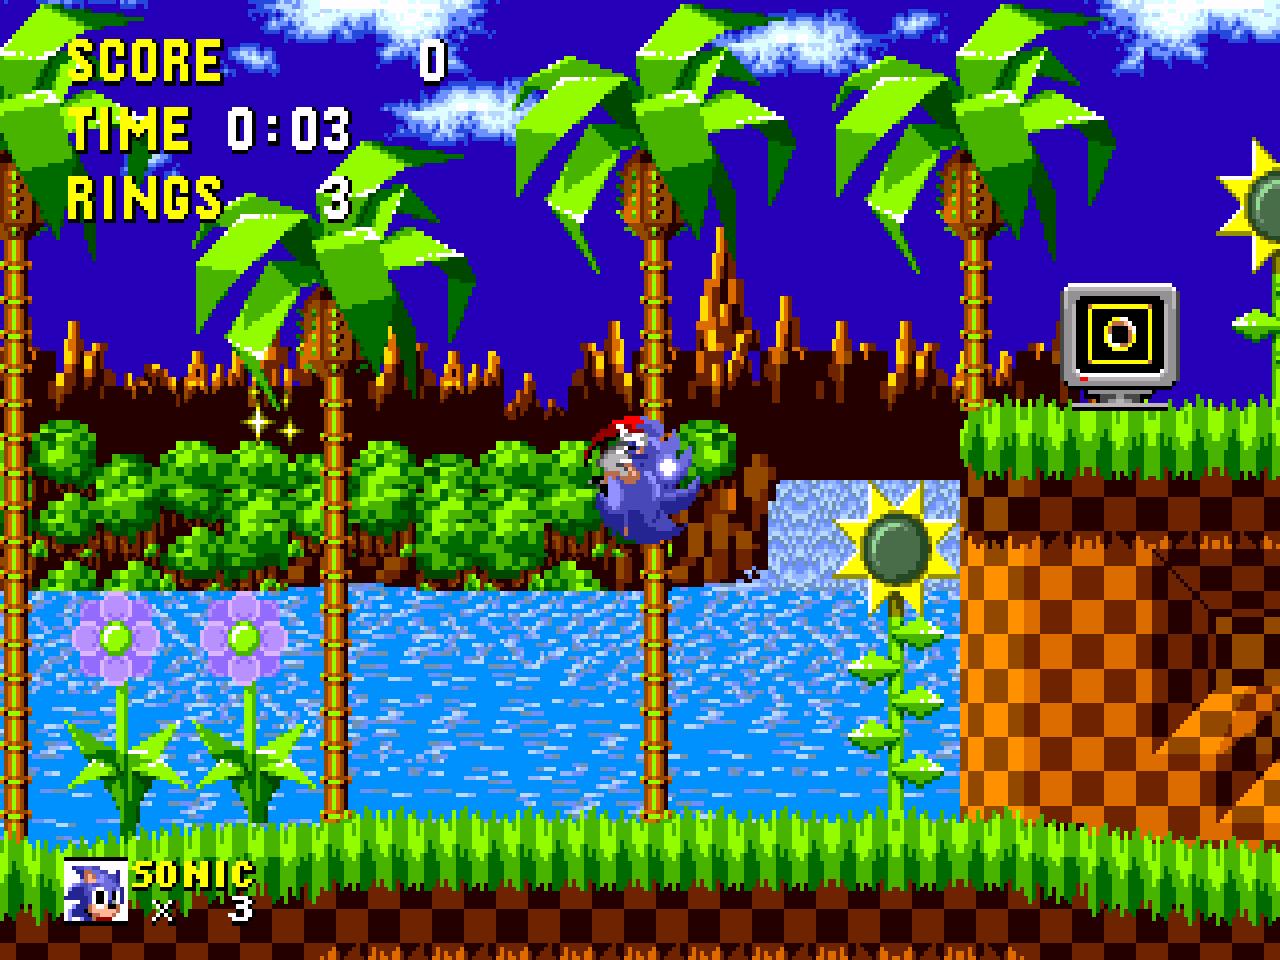 Sonic the Hedgehog Screenshots | GameFabrique